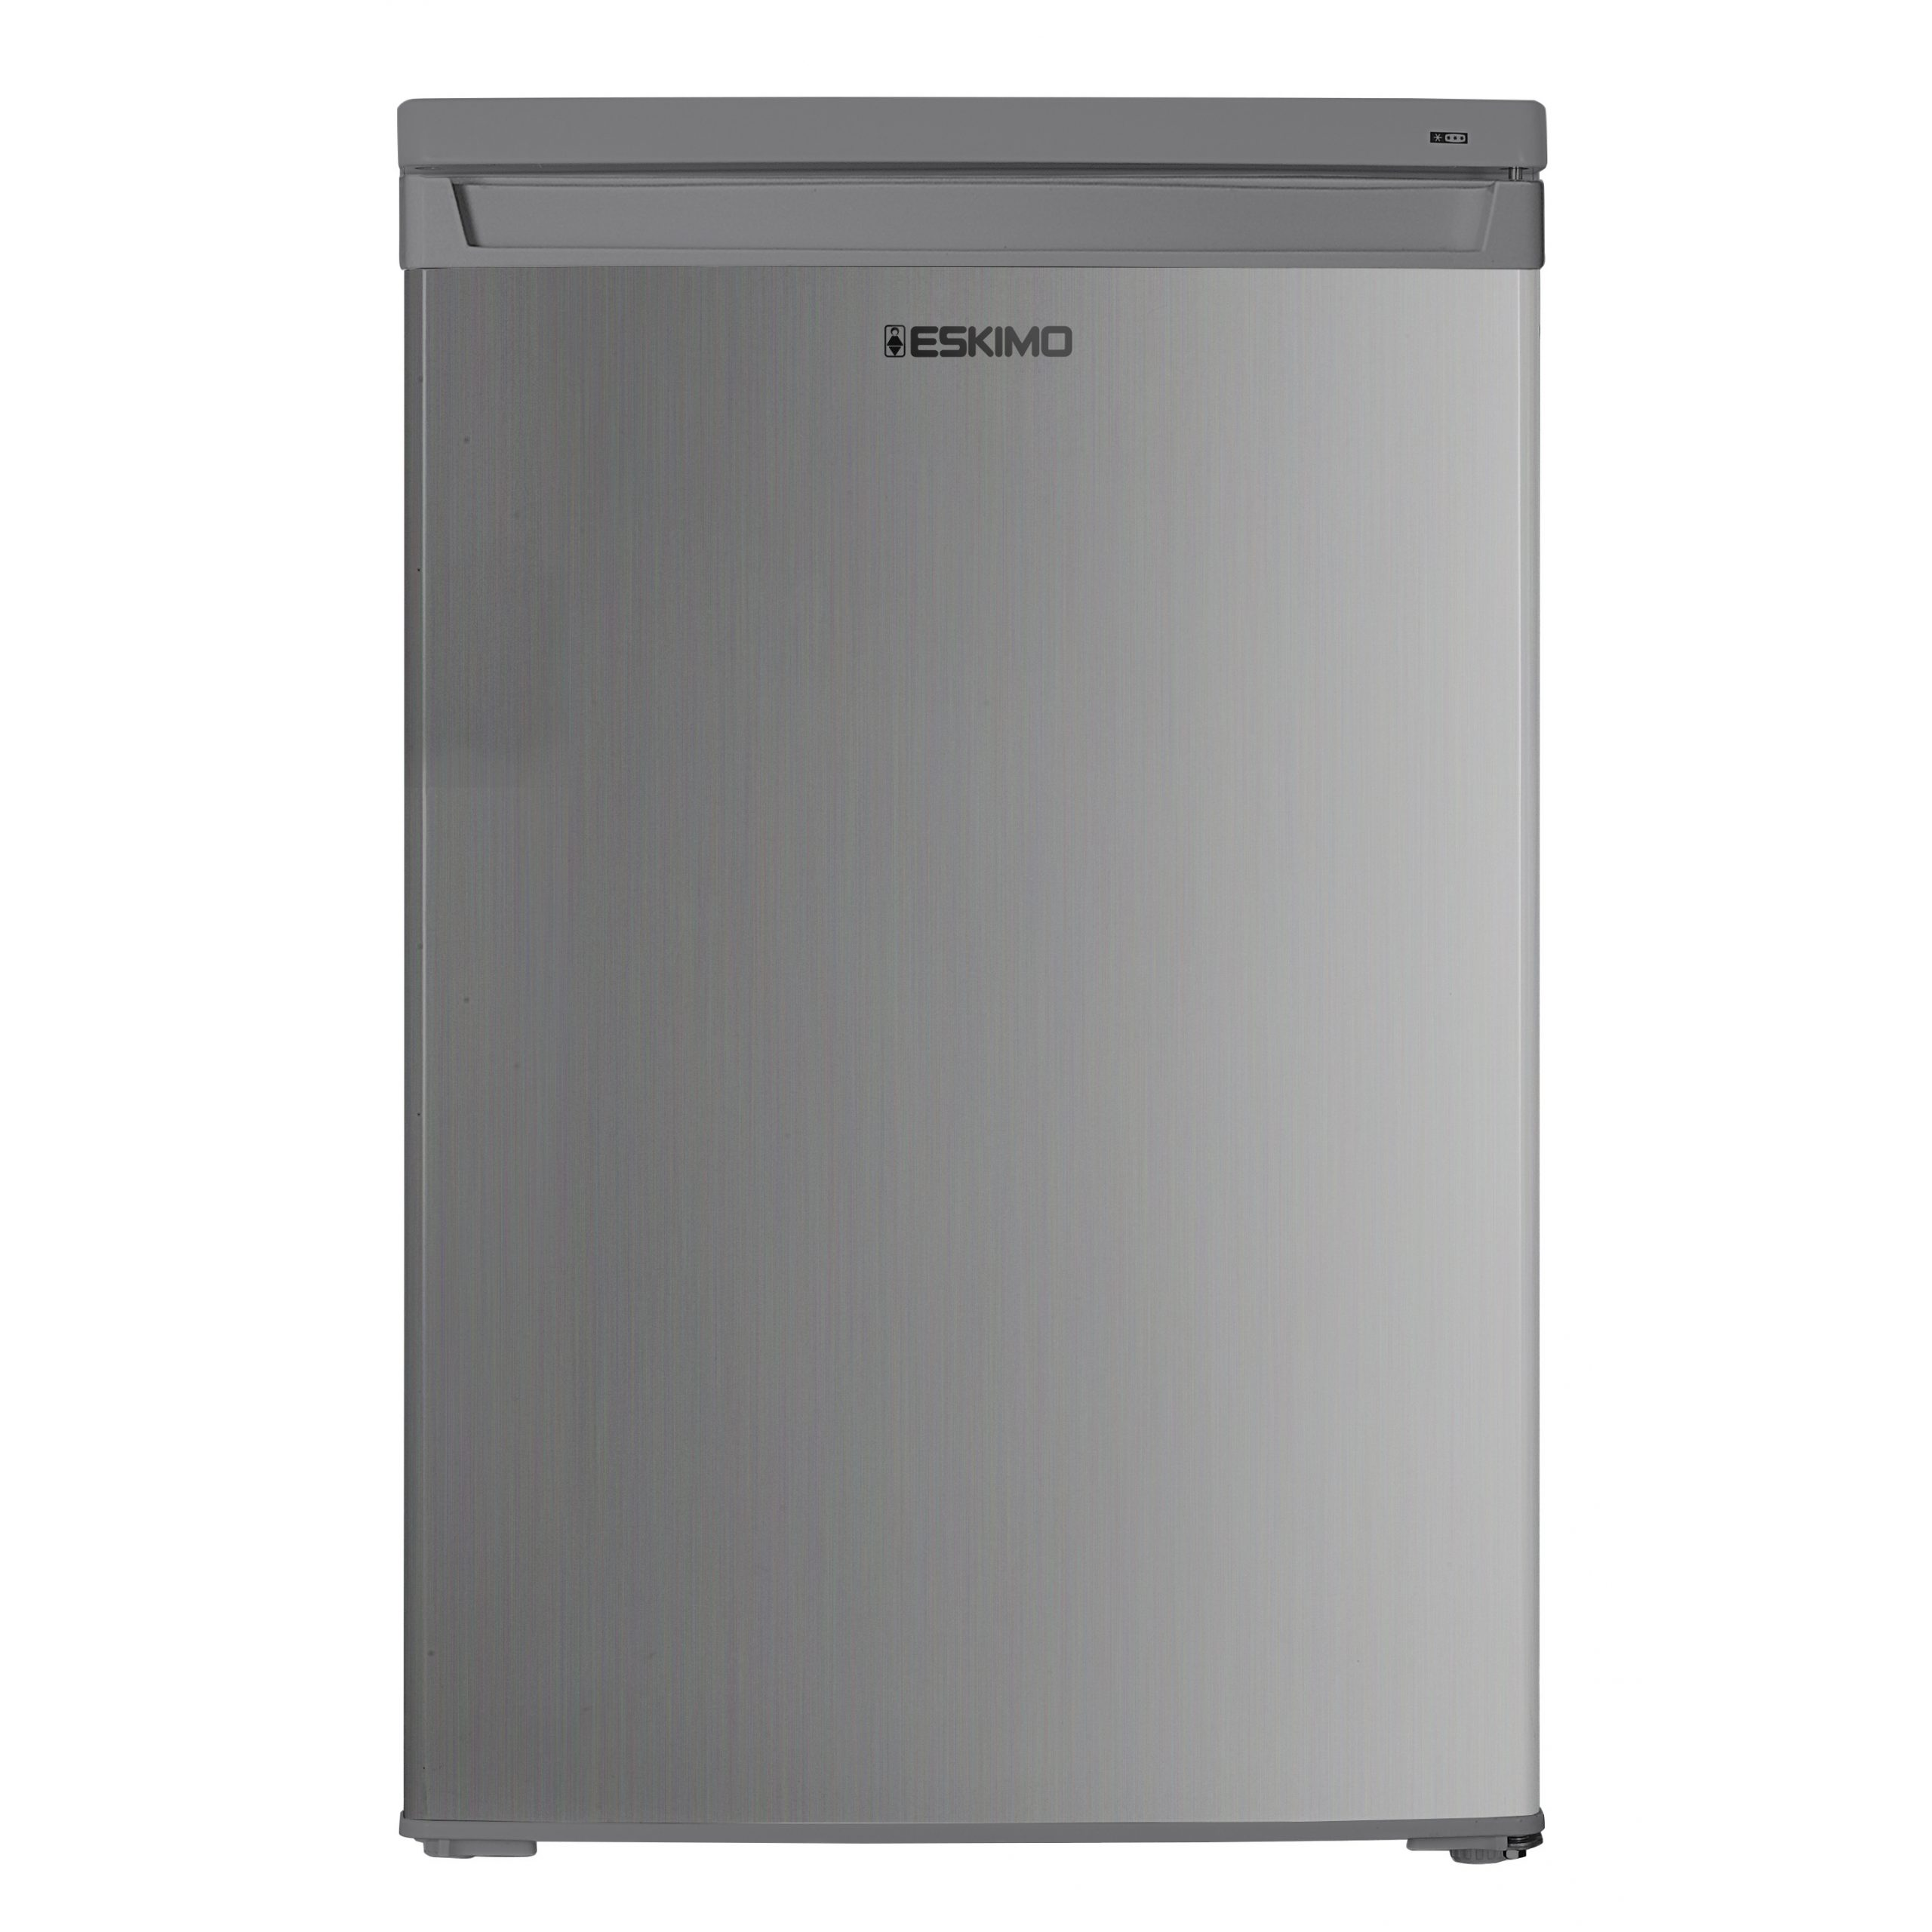 Eskimo Μονόπορτο Ψυγείο ES R1D118SFS